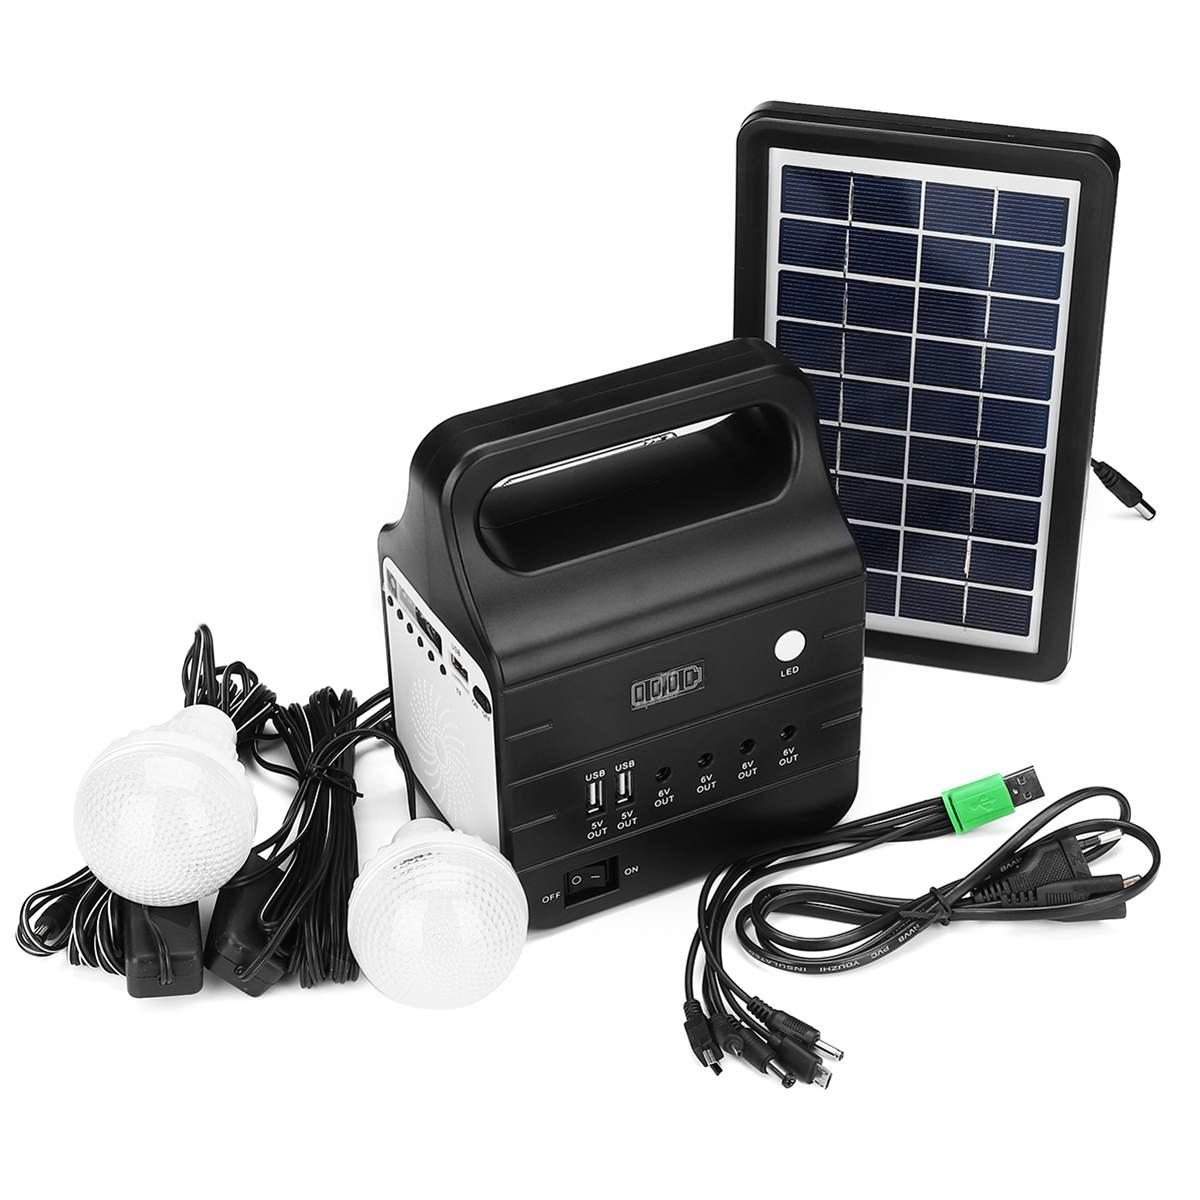 25W Solar Generator With Solar Power Panel 2xLED Bulb Solar-charging FM Support Stereo Speaker Multi-functional Generators